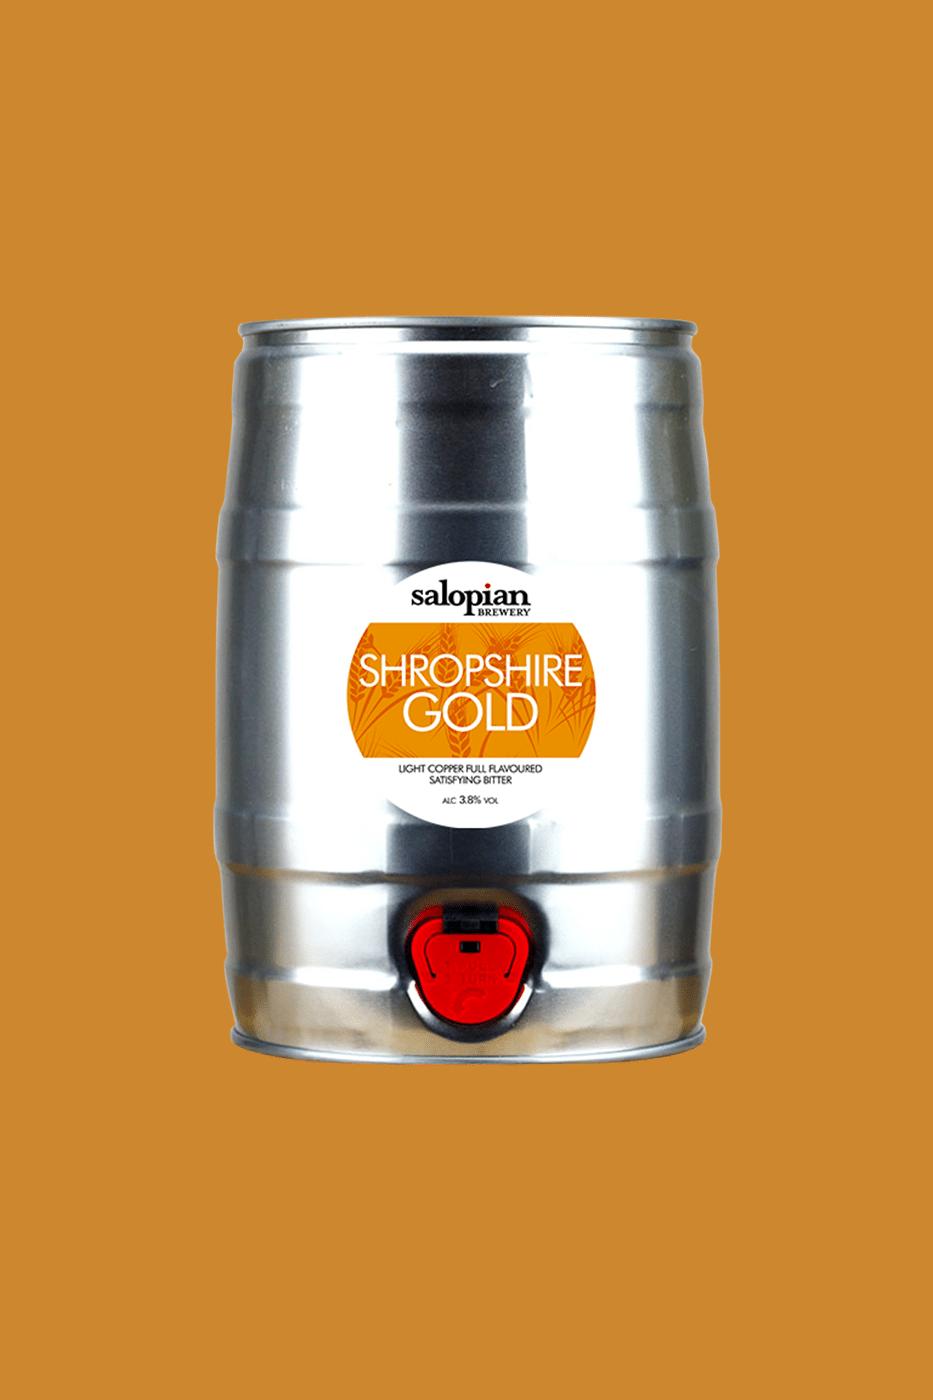 Shropshire-Gold-Keg